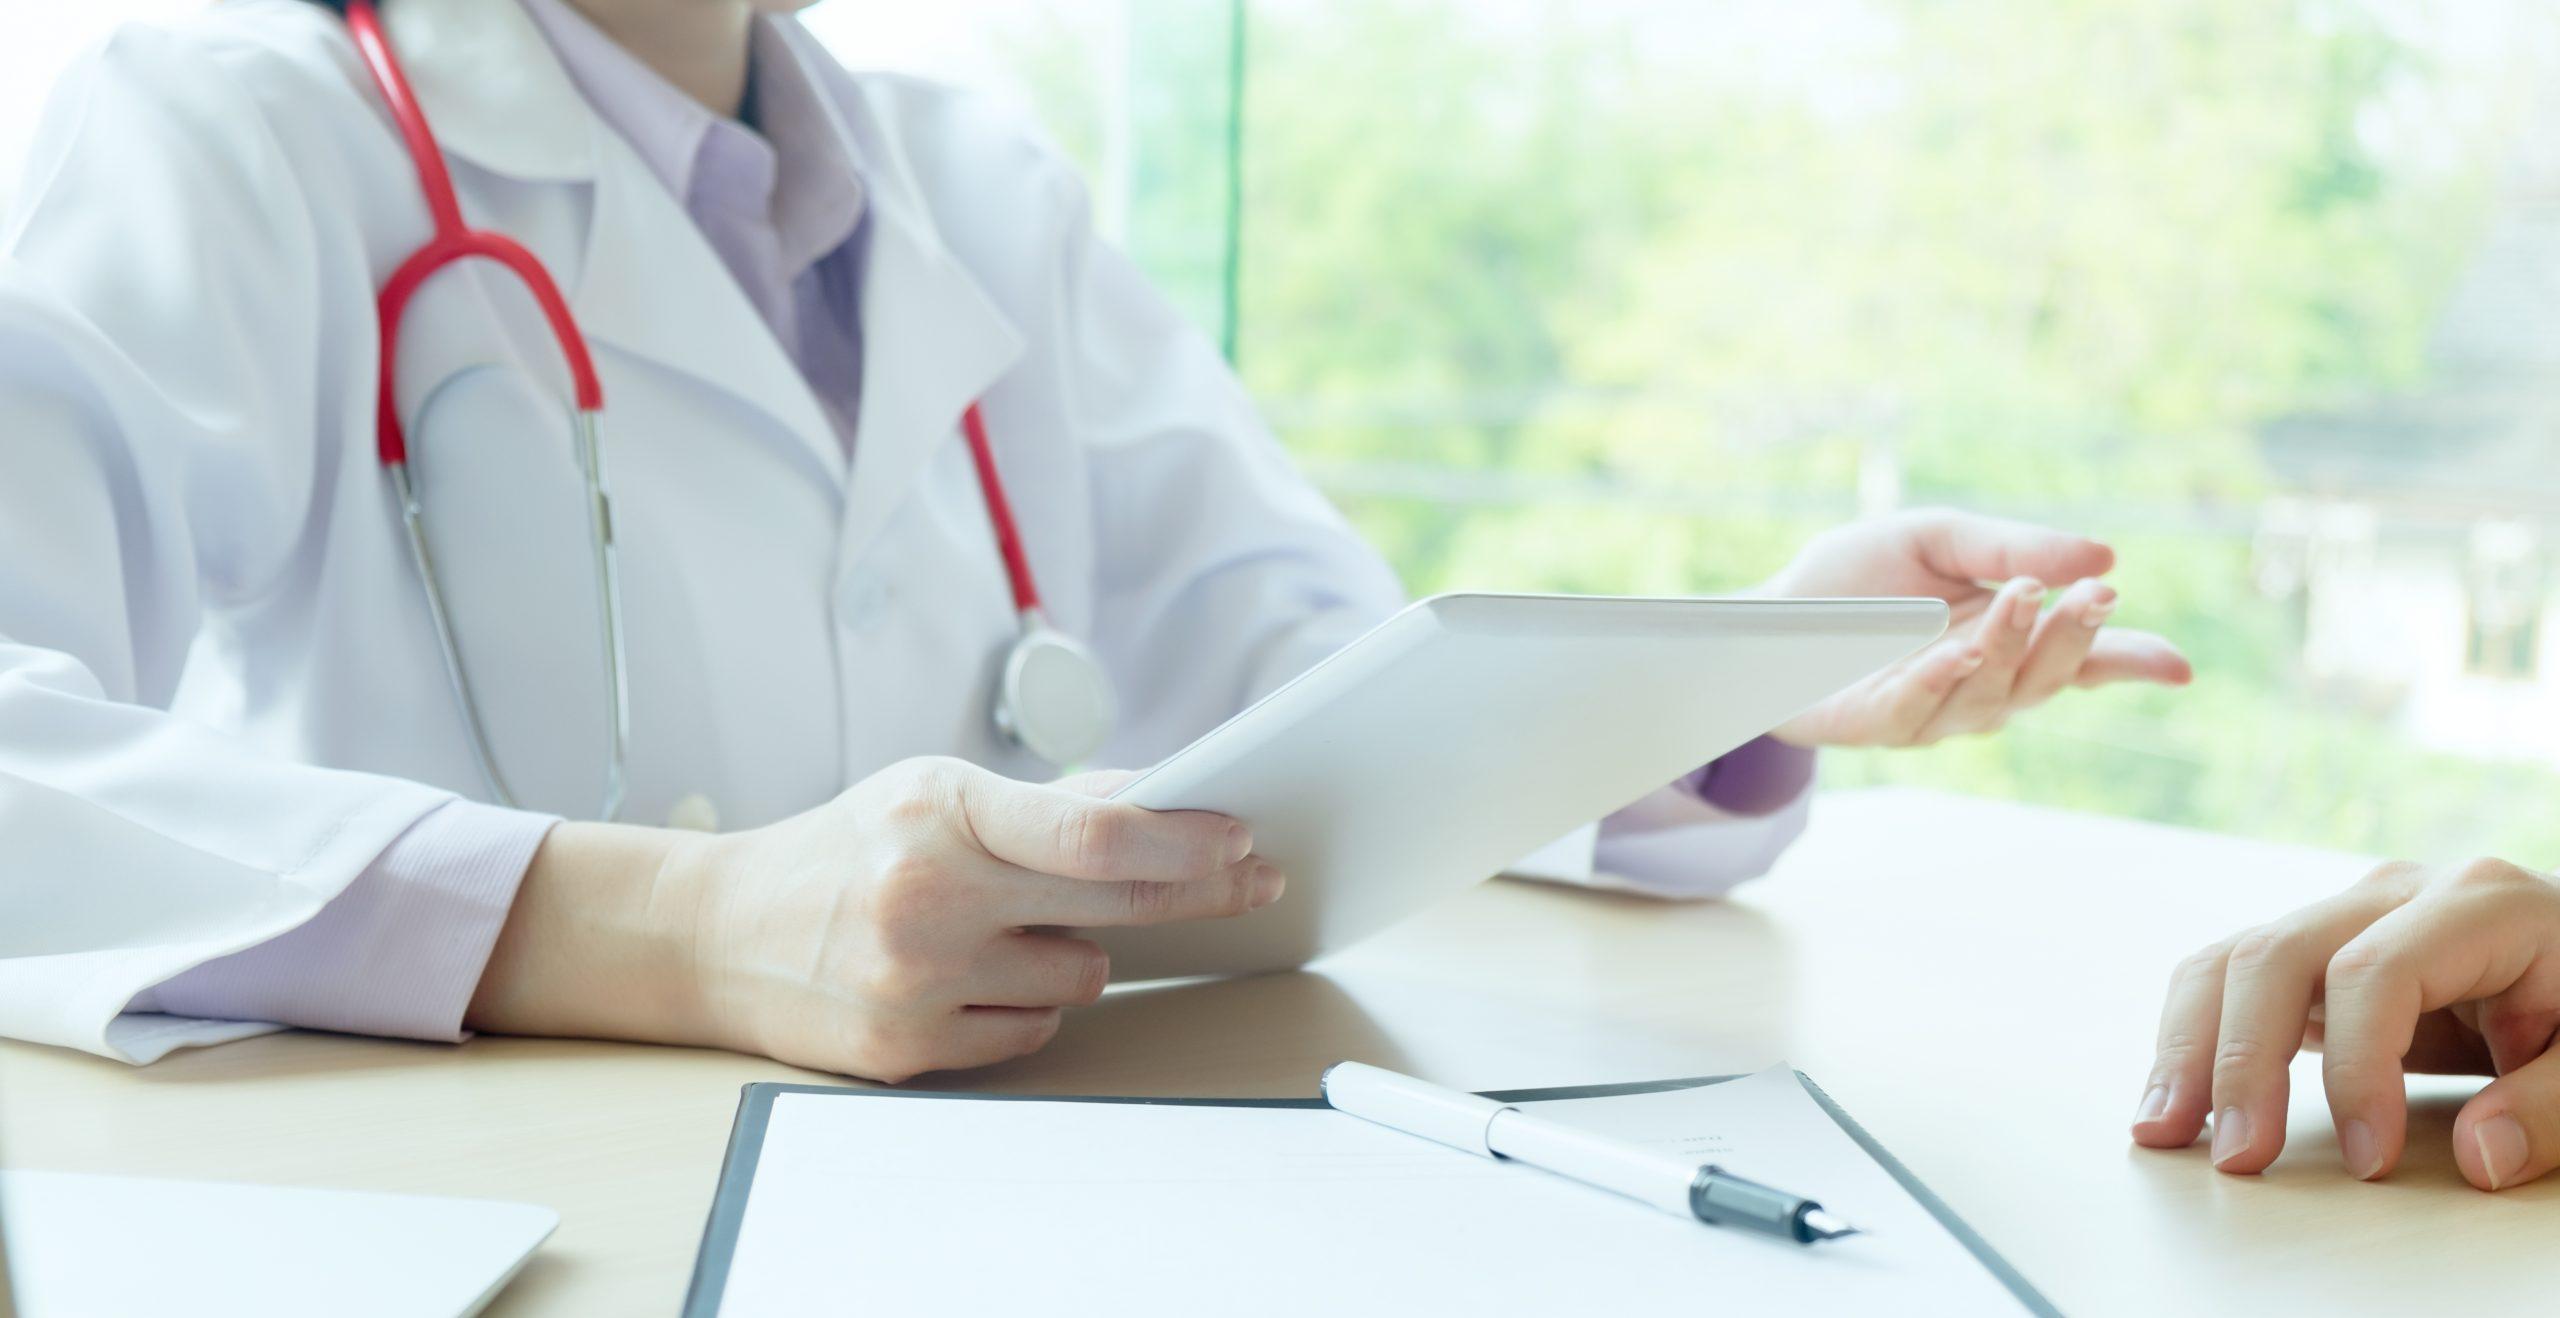 la visita in medicina integrata